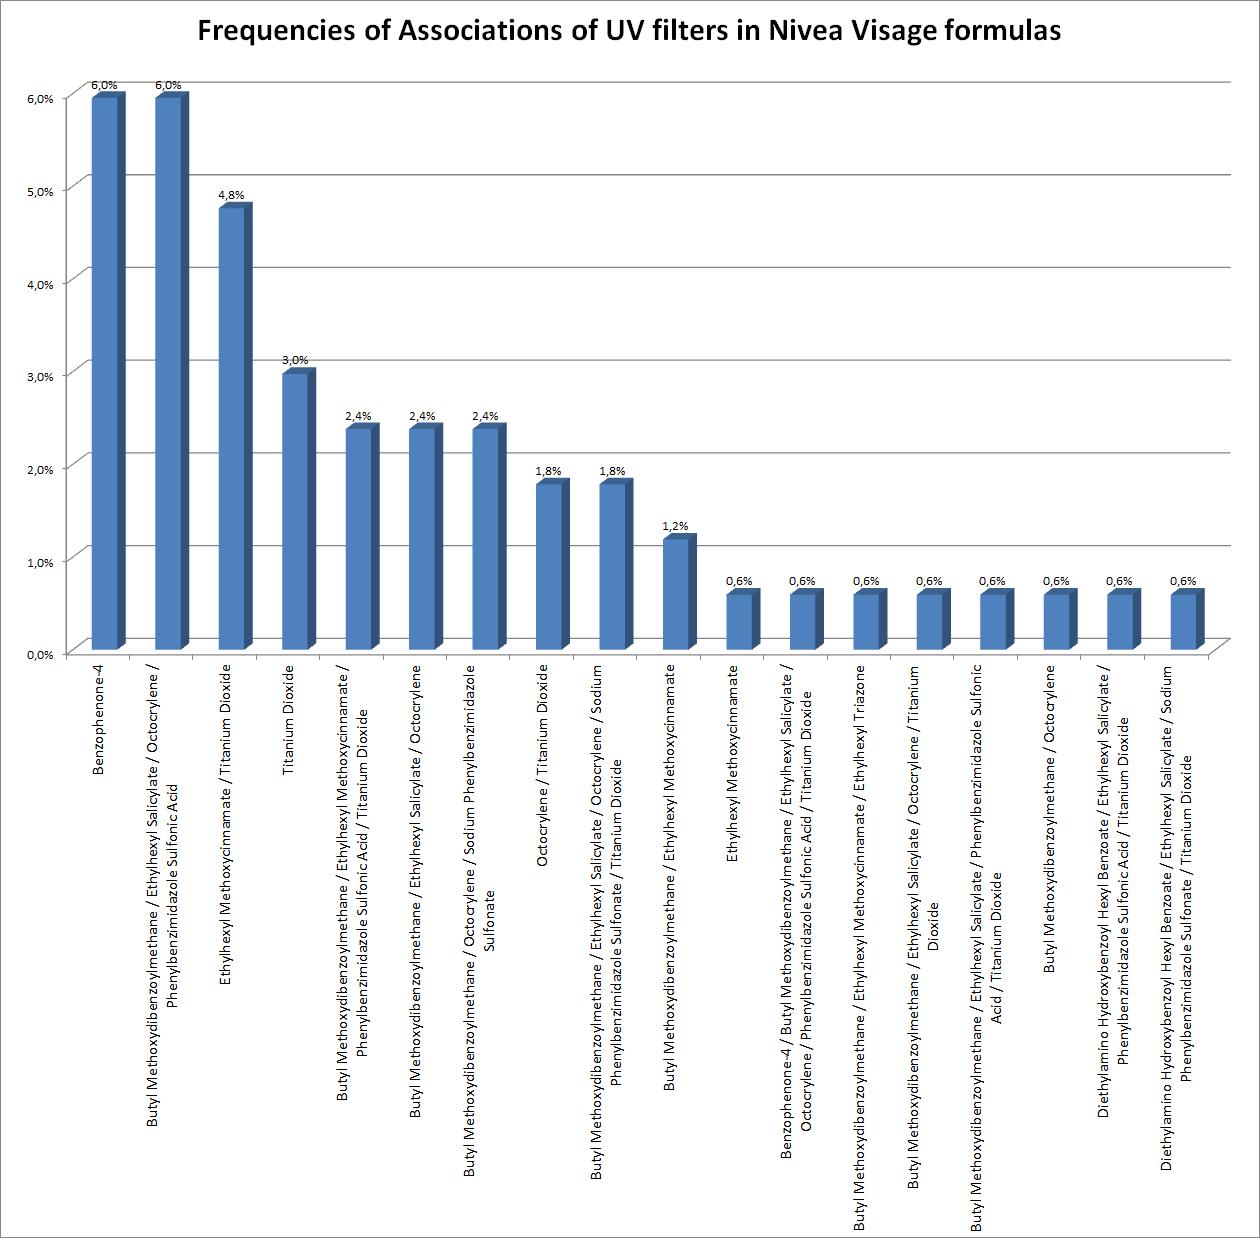 Frequencies of Associations of UV Filters in Nivea Visage formulas